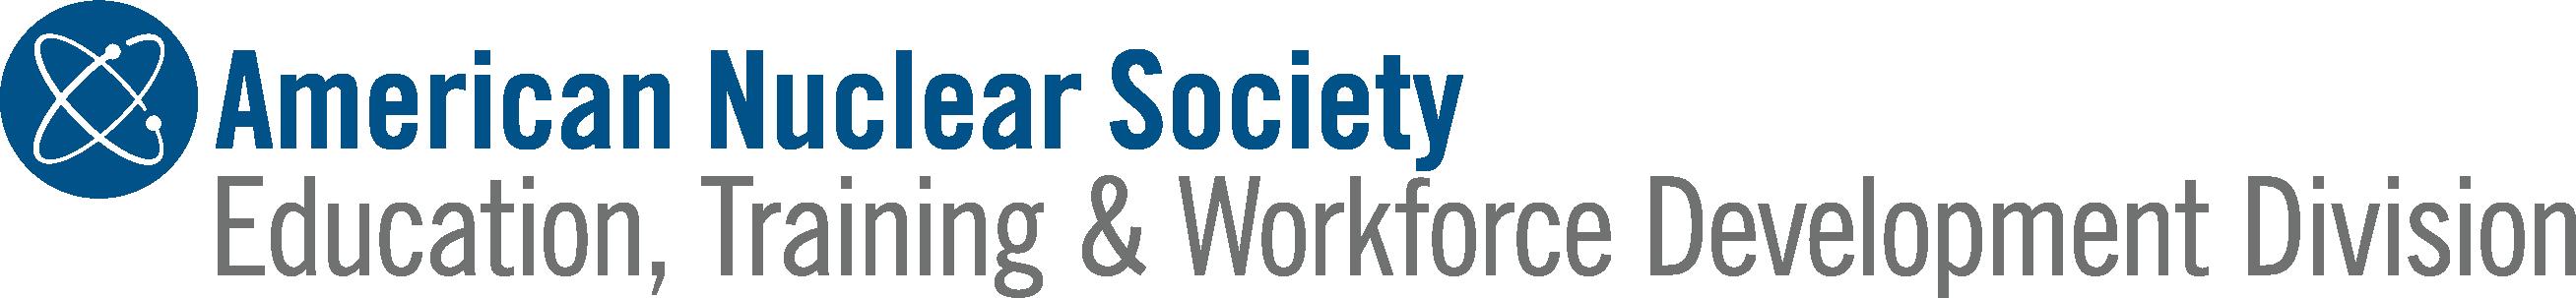 Education, Training & Workforce Development